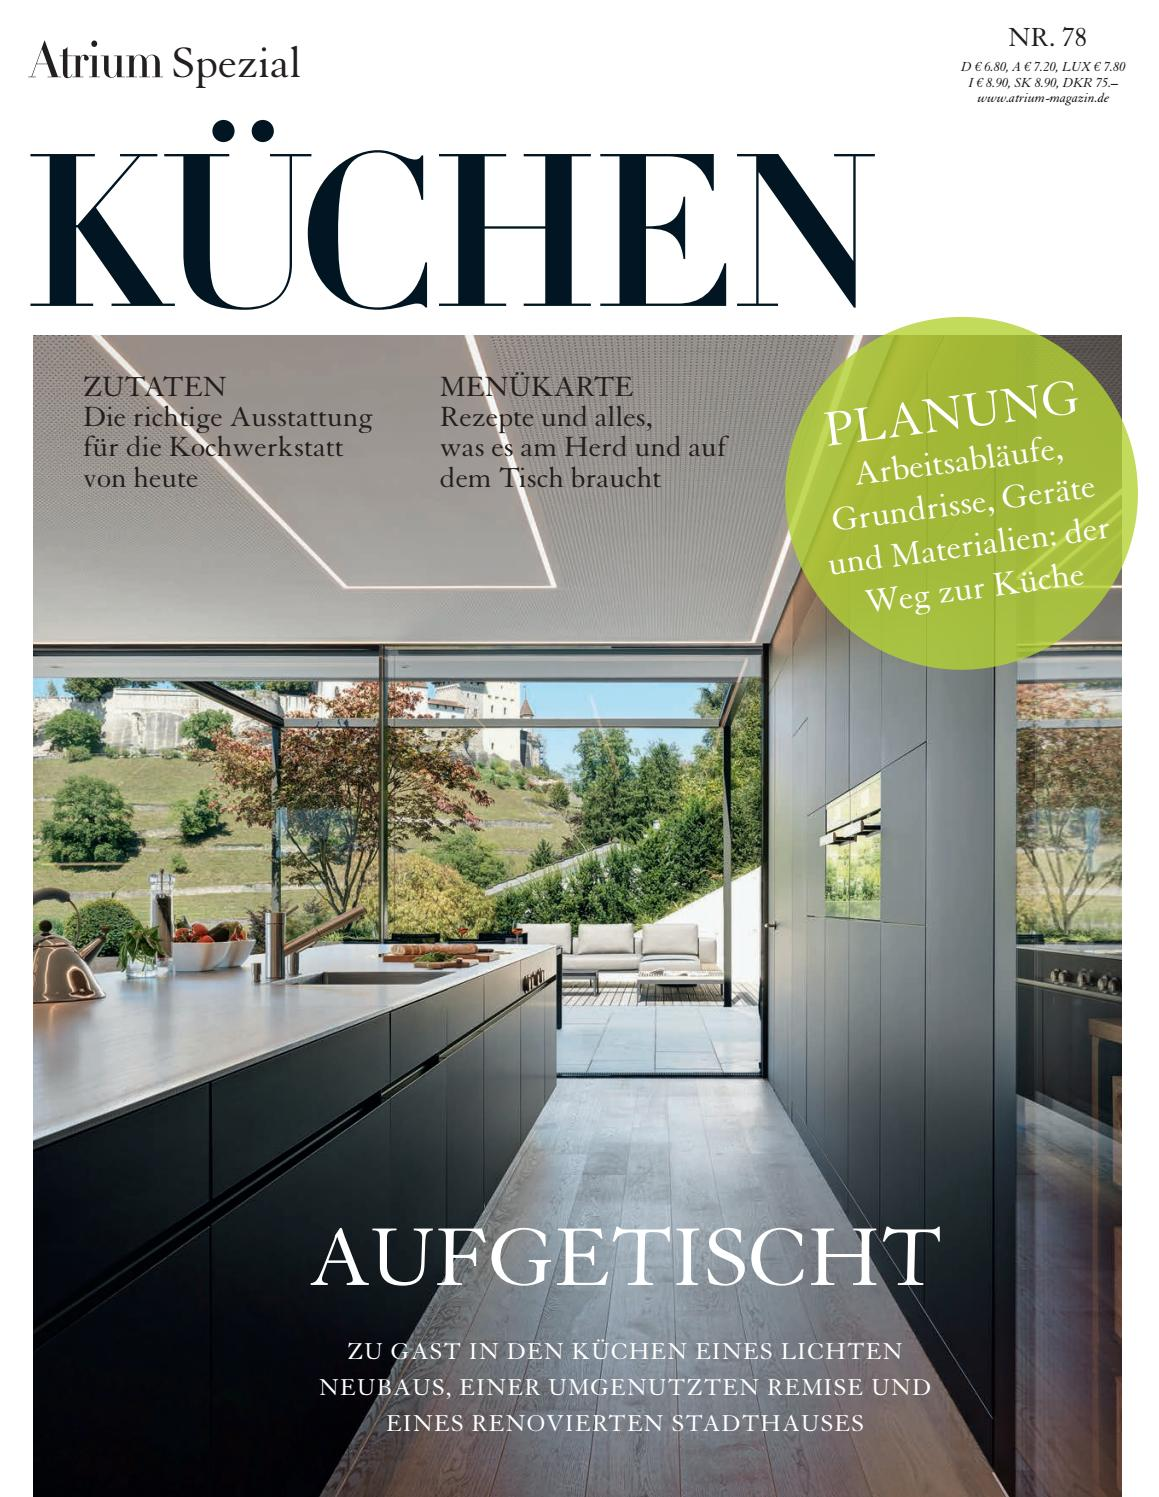 Atrium Spezial Kuchen 2017 18 By Archithema Verlag Issuu